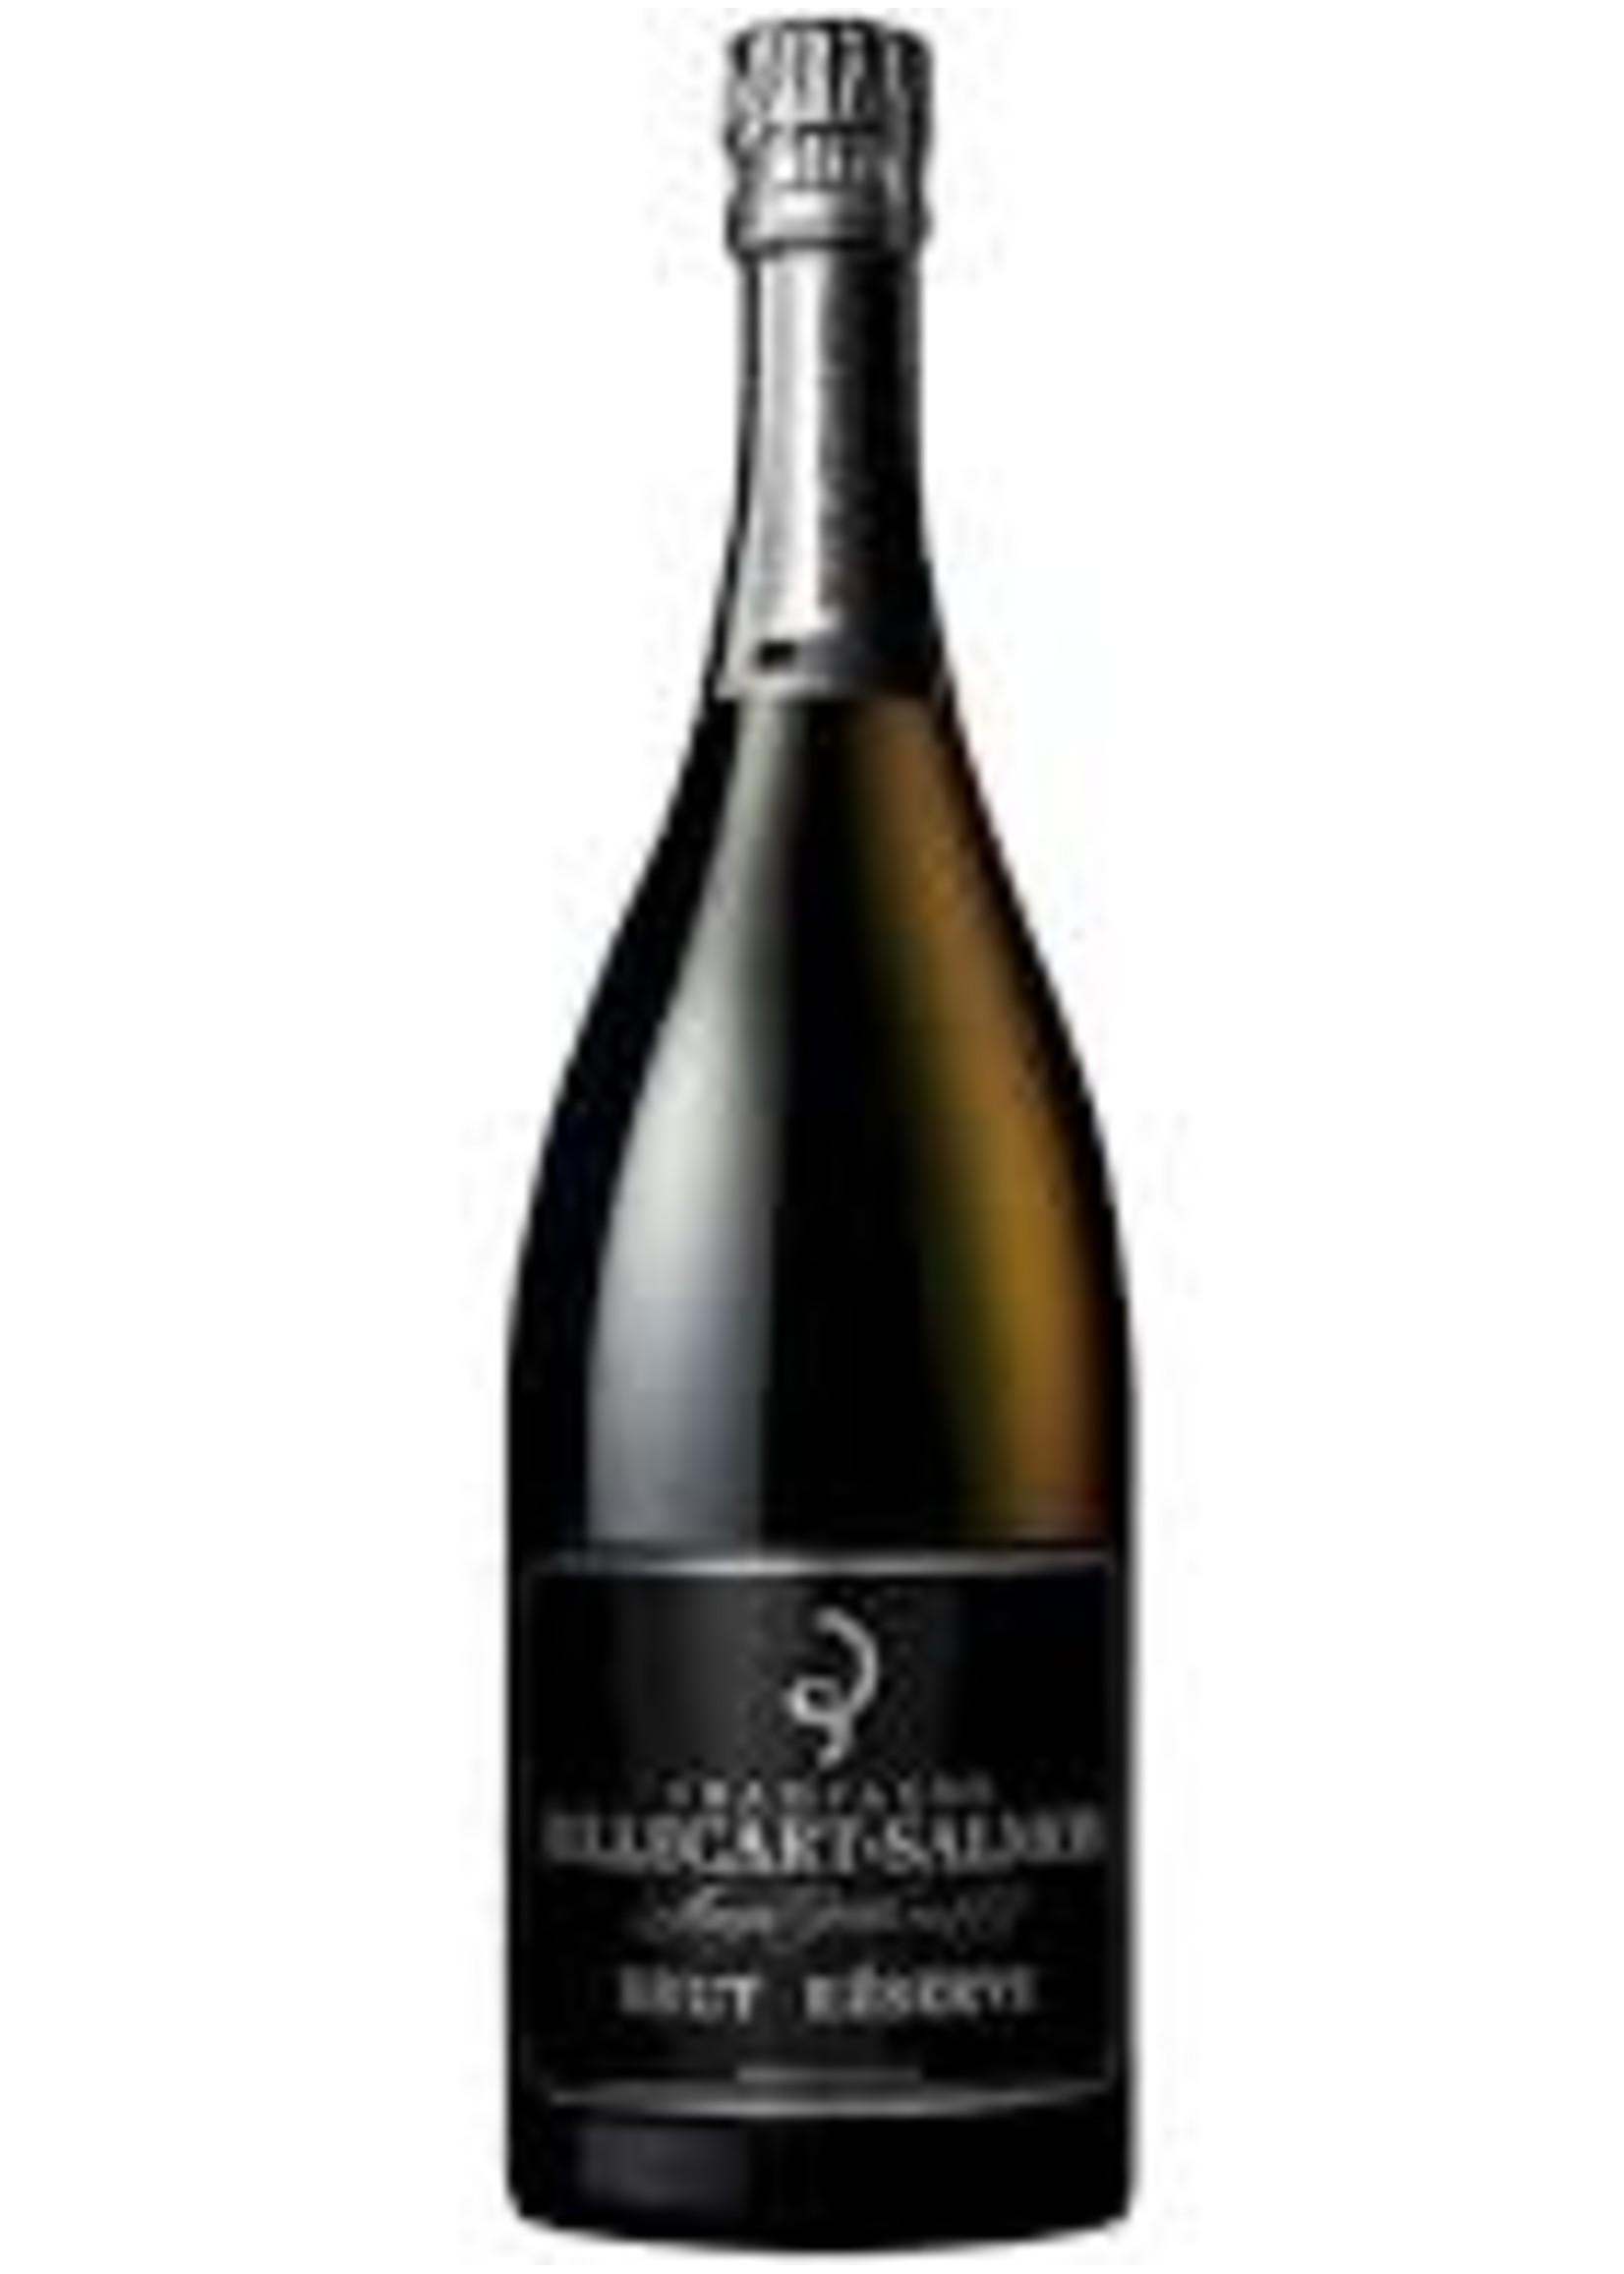 Billecart Salmon Champagne NV Brut Reserve 750ml